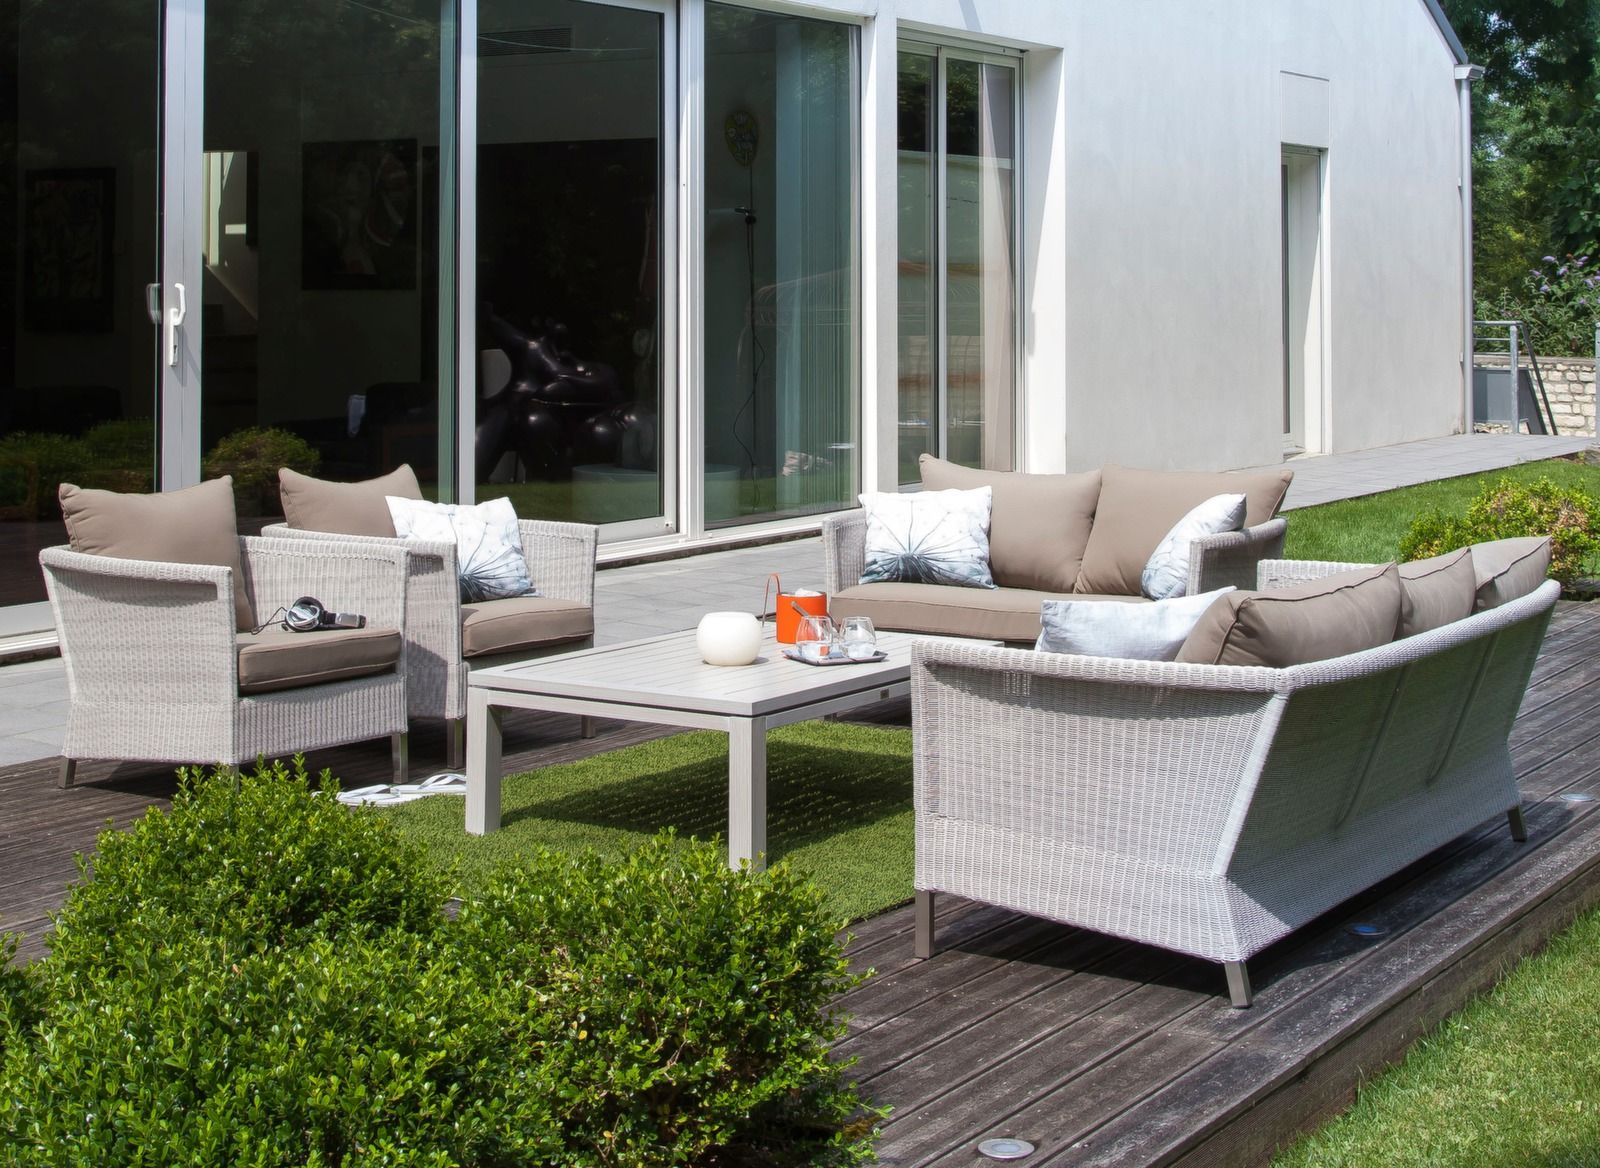 Salon De Jardin Bas Blanc Et Taupe Thyme Oceo Proloisirs Salon